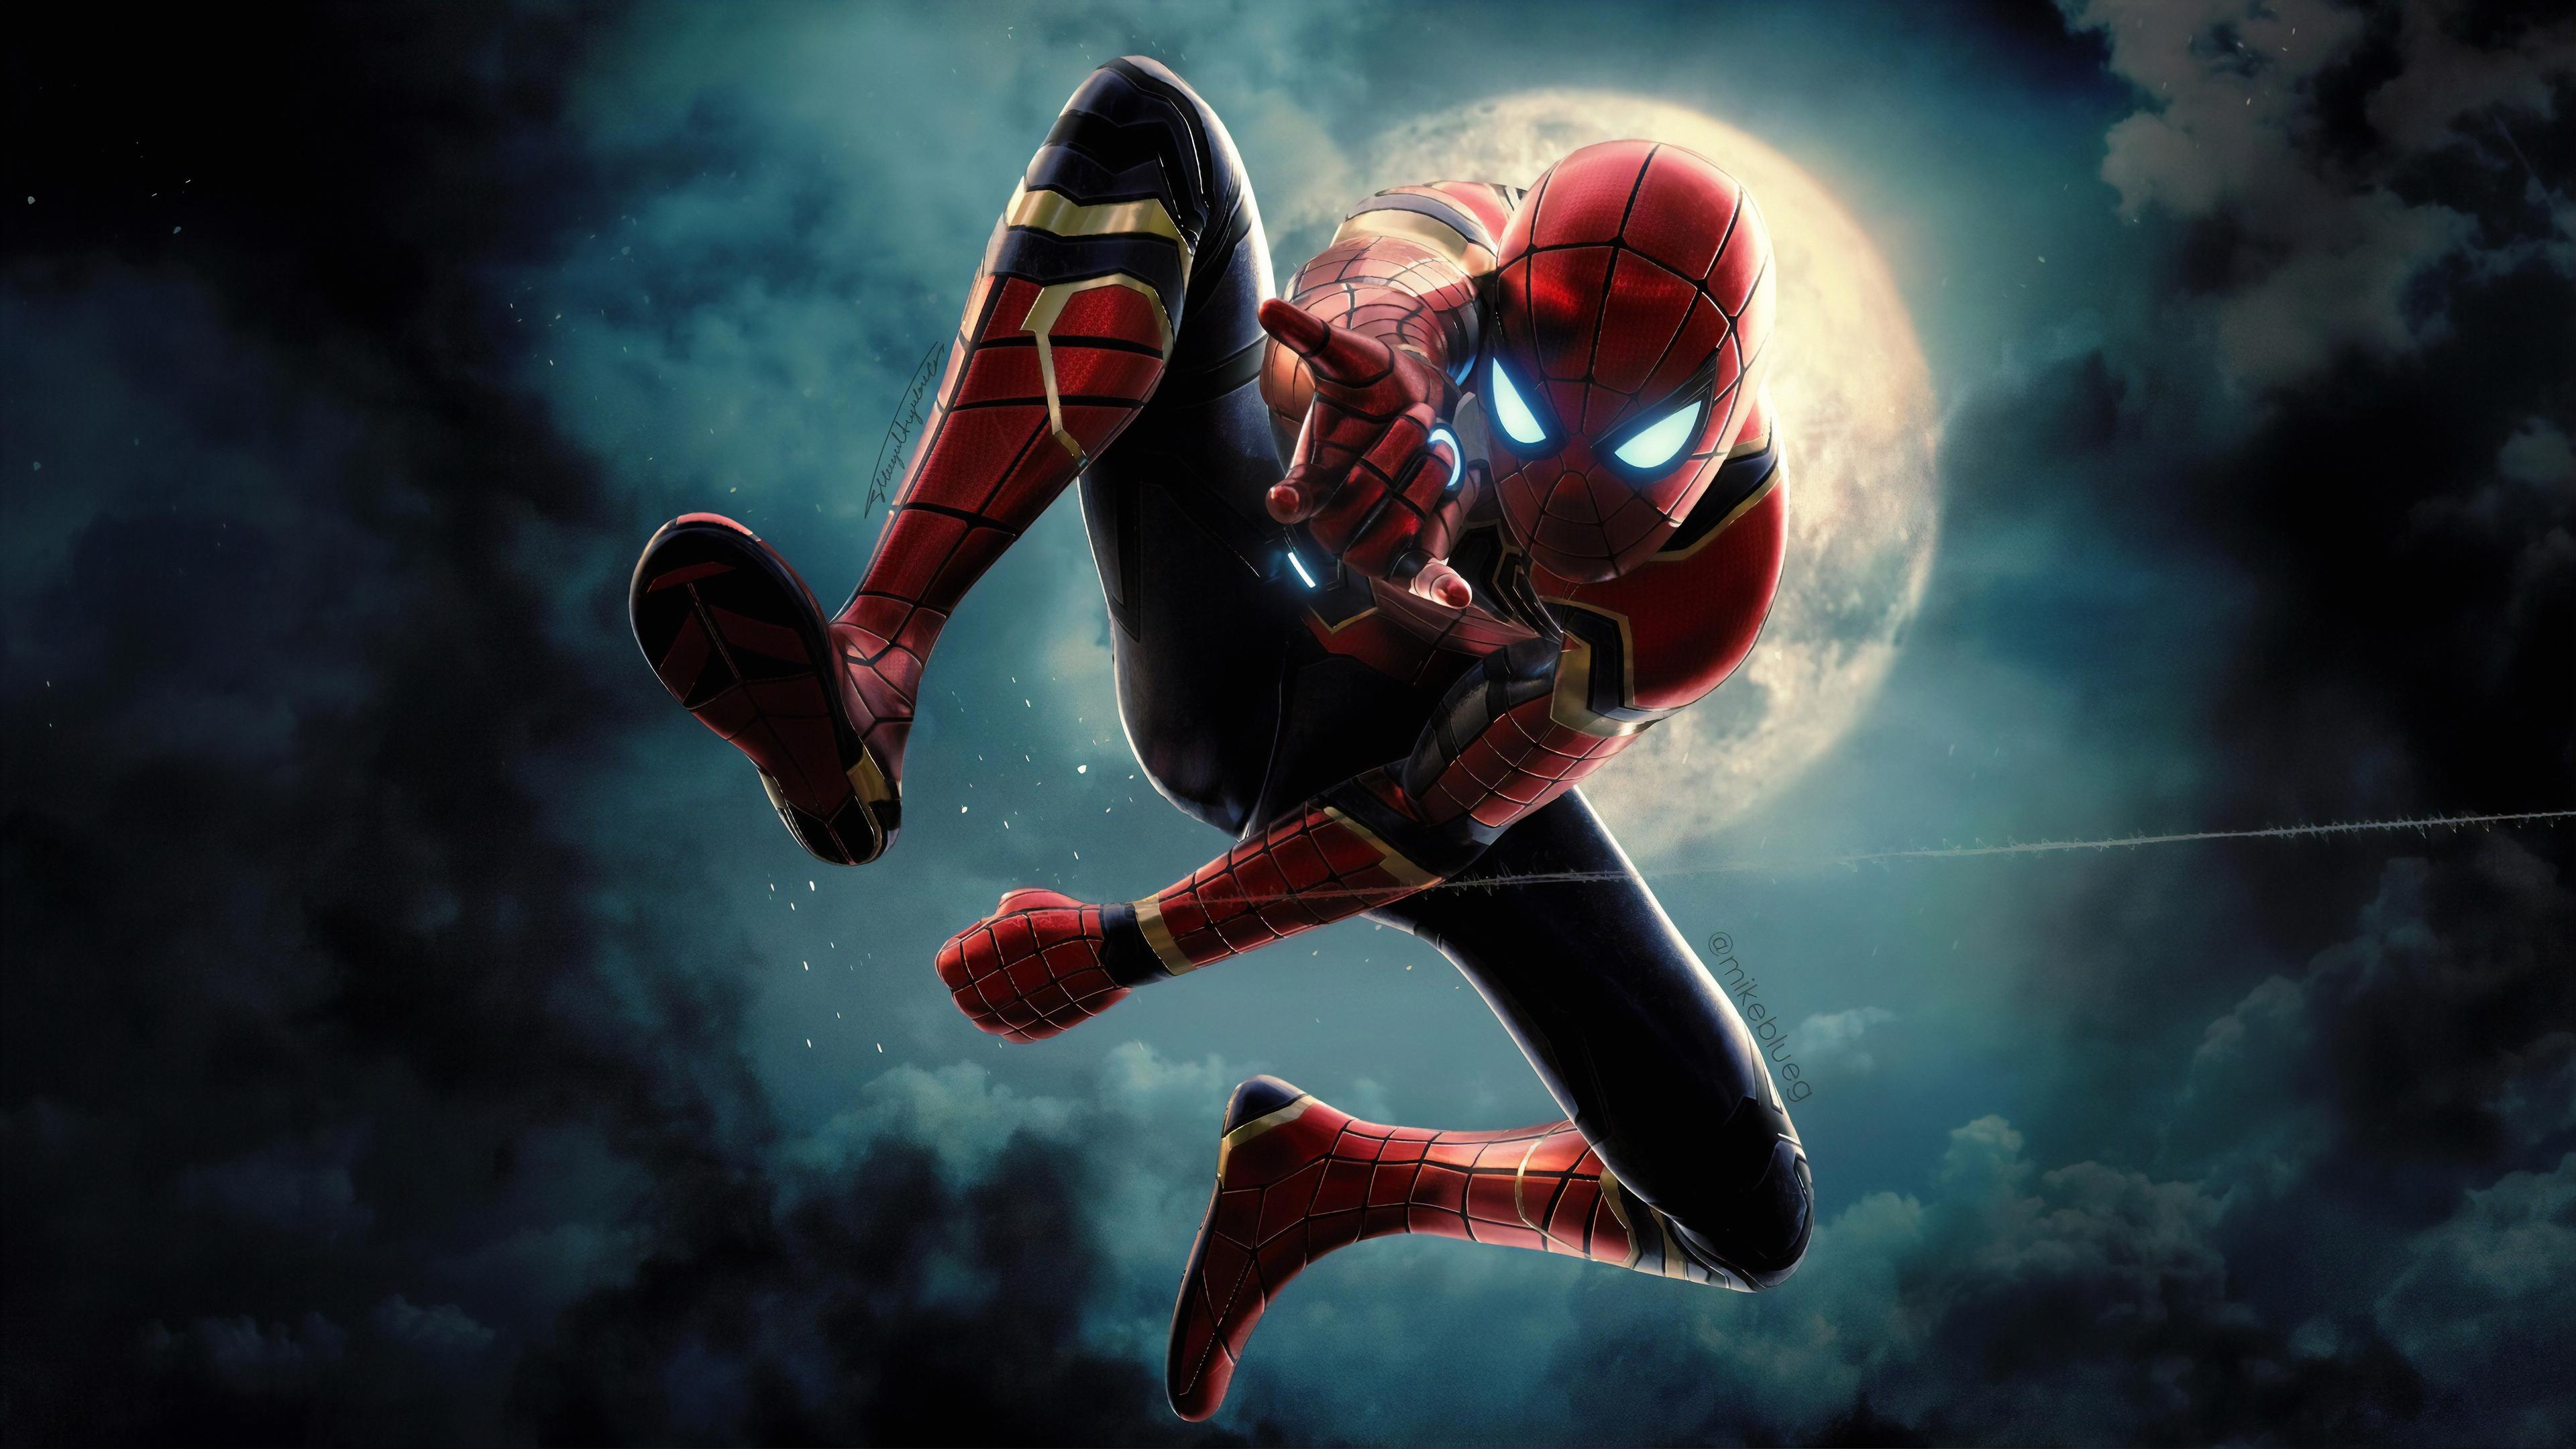 spiderman new 1570918444 - Spiderman New - superheroes wallpapers, spiderman wallpapers, hd-wallpapers, digital art wallpapers, artwork wallpapers, artstation wallpapers, art wallpapers, 4k-wallpapers